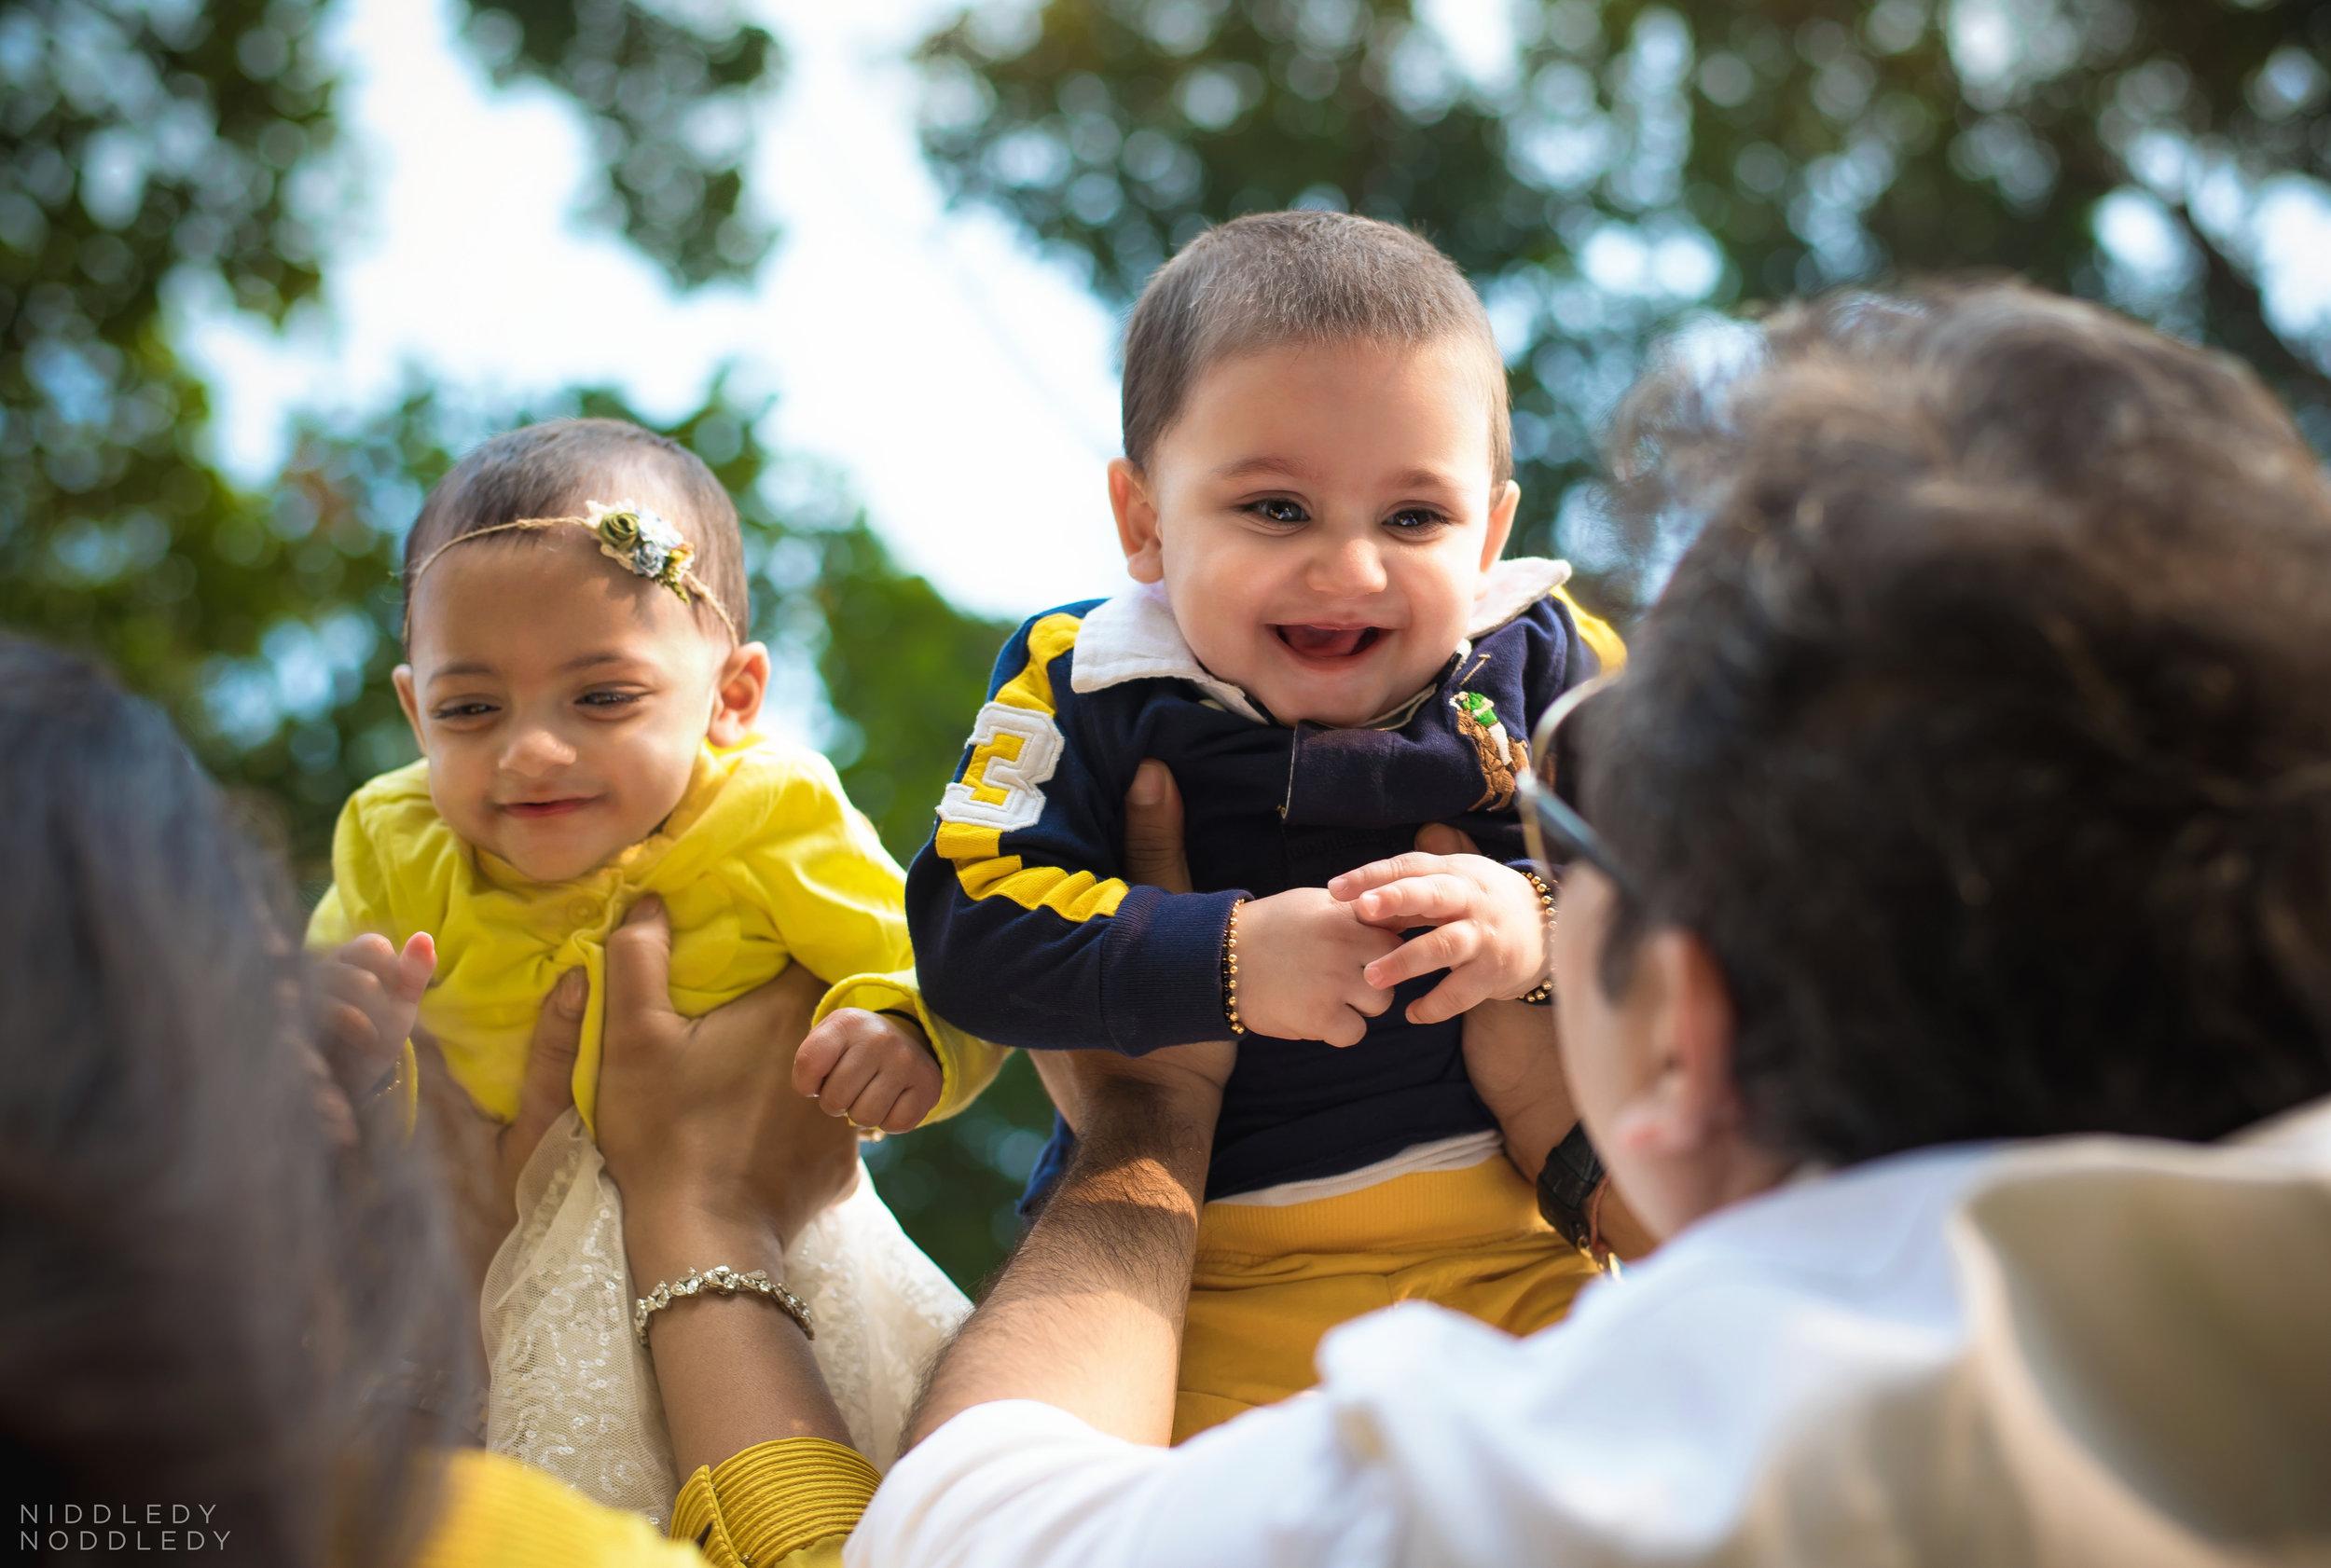 Shivaya-Yajur Twins Photoshoot ❤ NiddledyNoddledy.com ~ Bumps to Babies Photography, Kolkata - 17.jpg